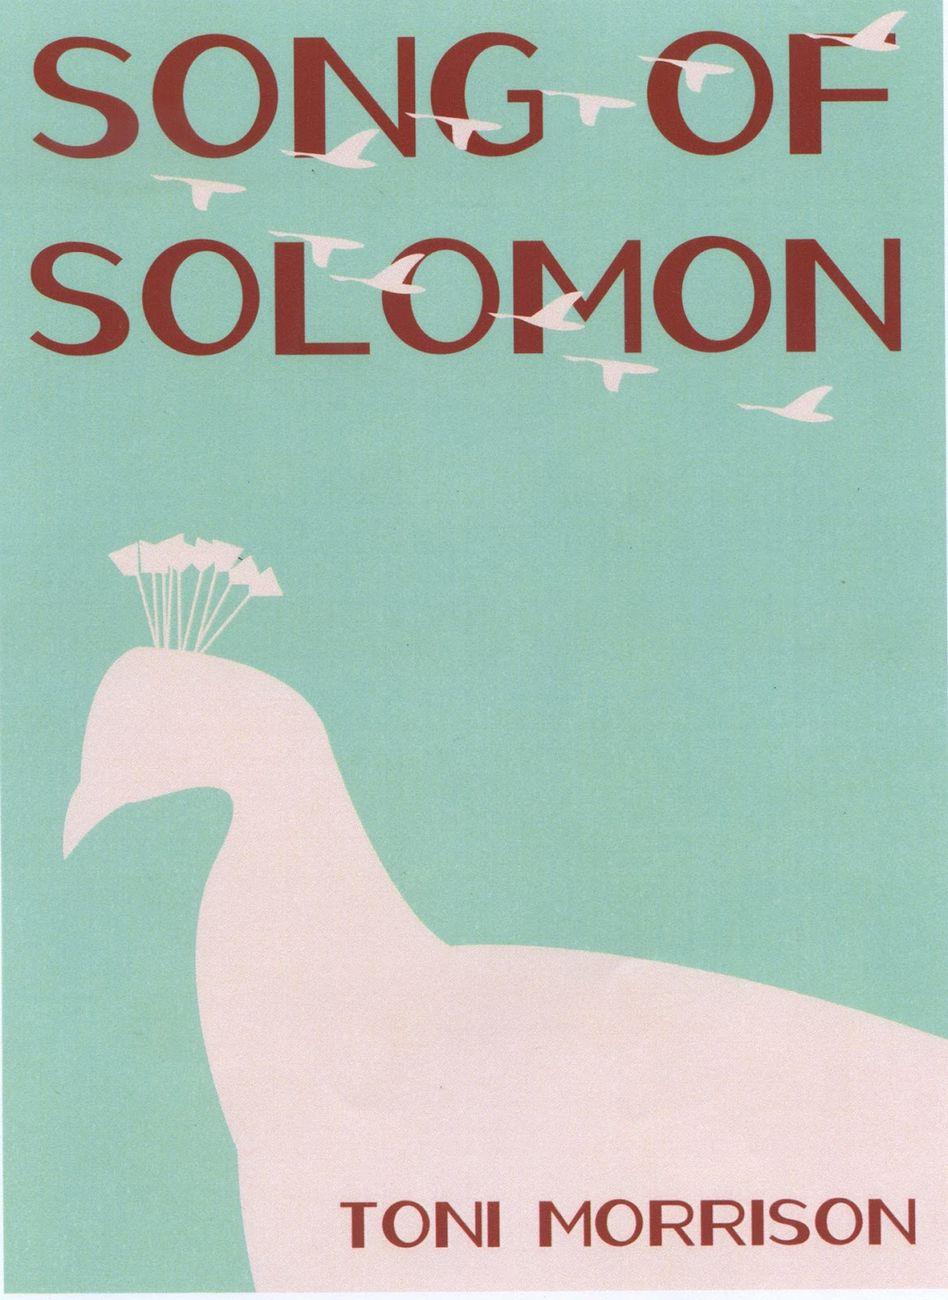 Toni Morrison, Song of Solomon, 1977